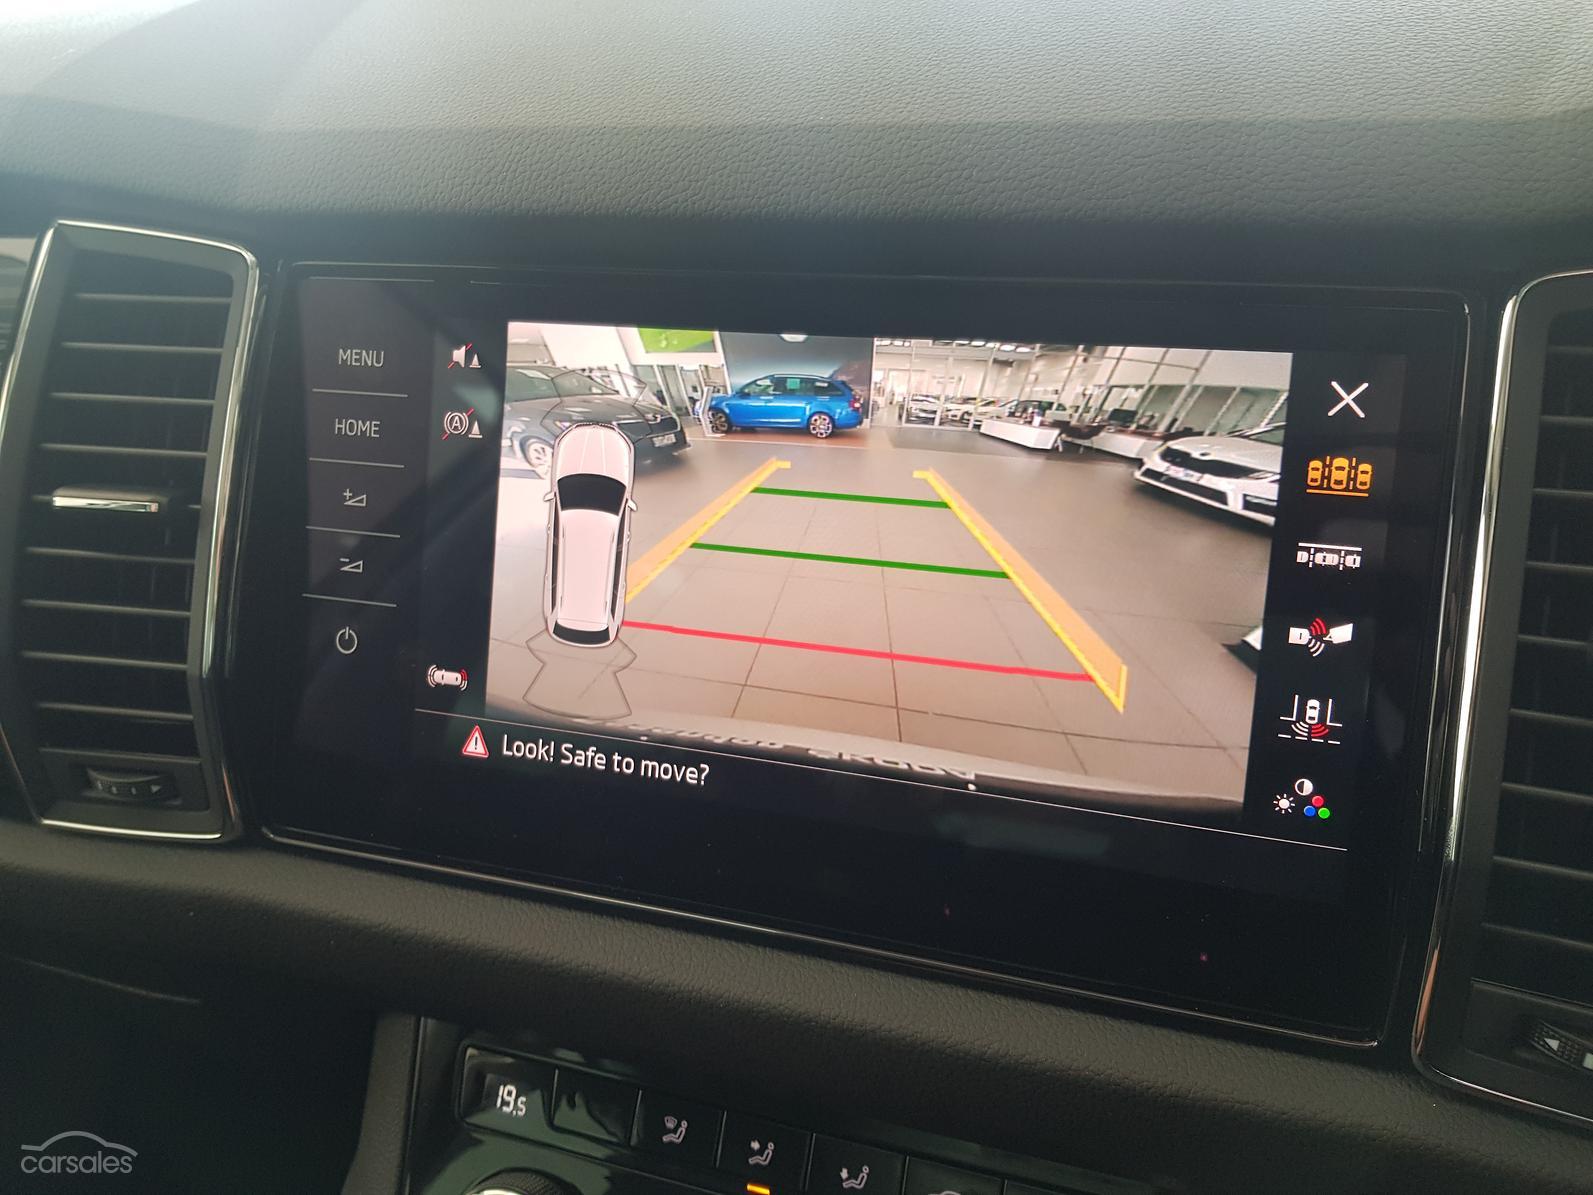 2018 SKODA Kodiaq 132TSI Auto 4x4 MY19-OAG-AD-17396850 - carsales com au